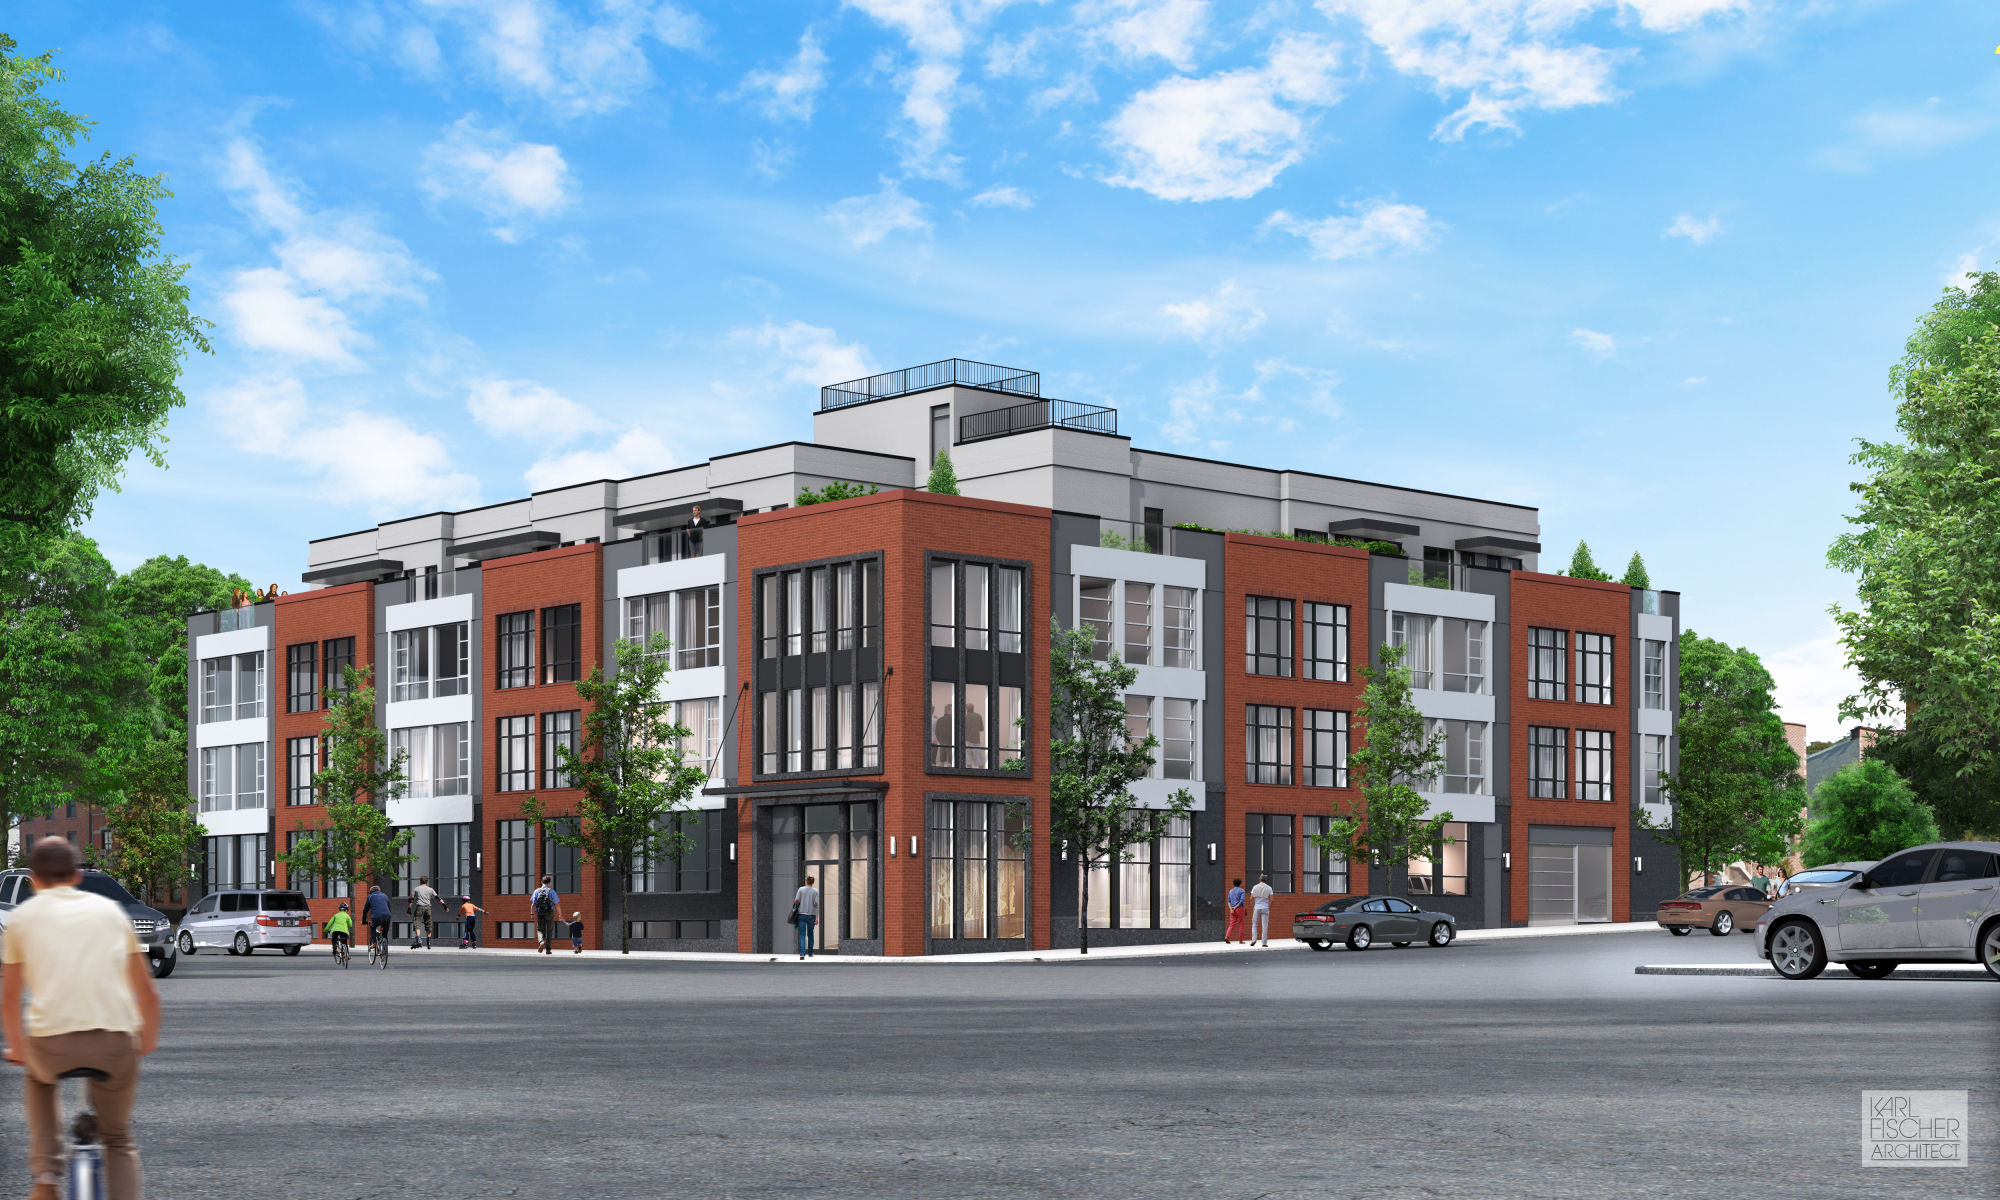 695 6th Avenue. rendering by Karl Fischer Architect